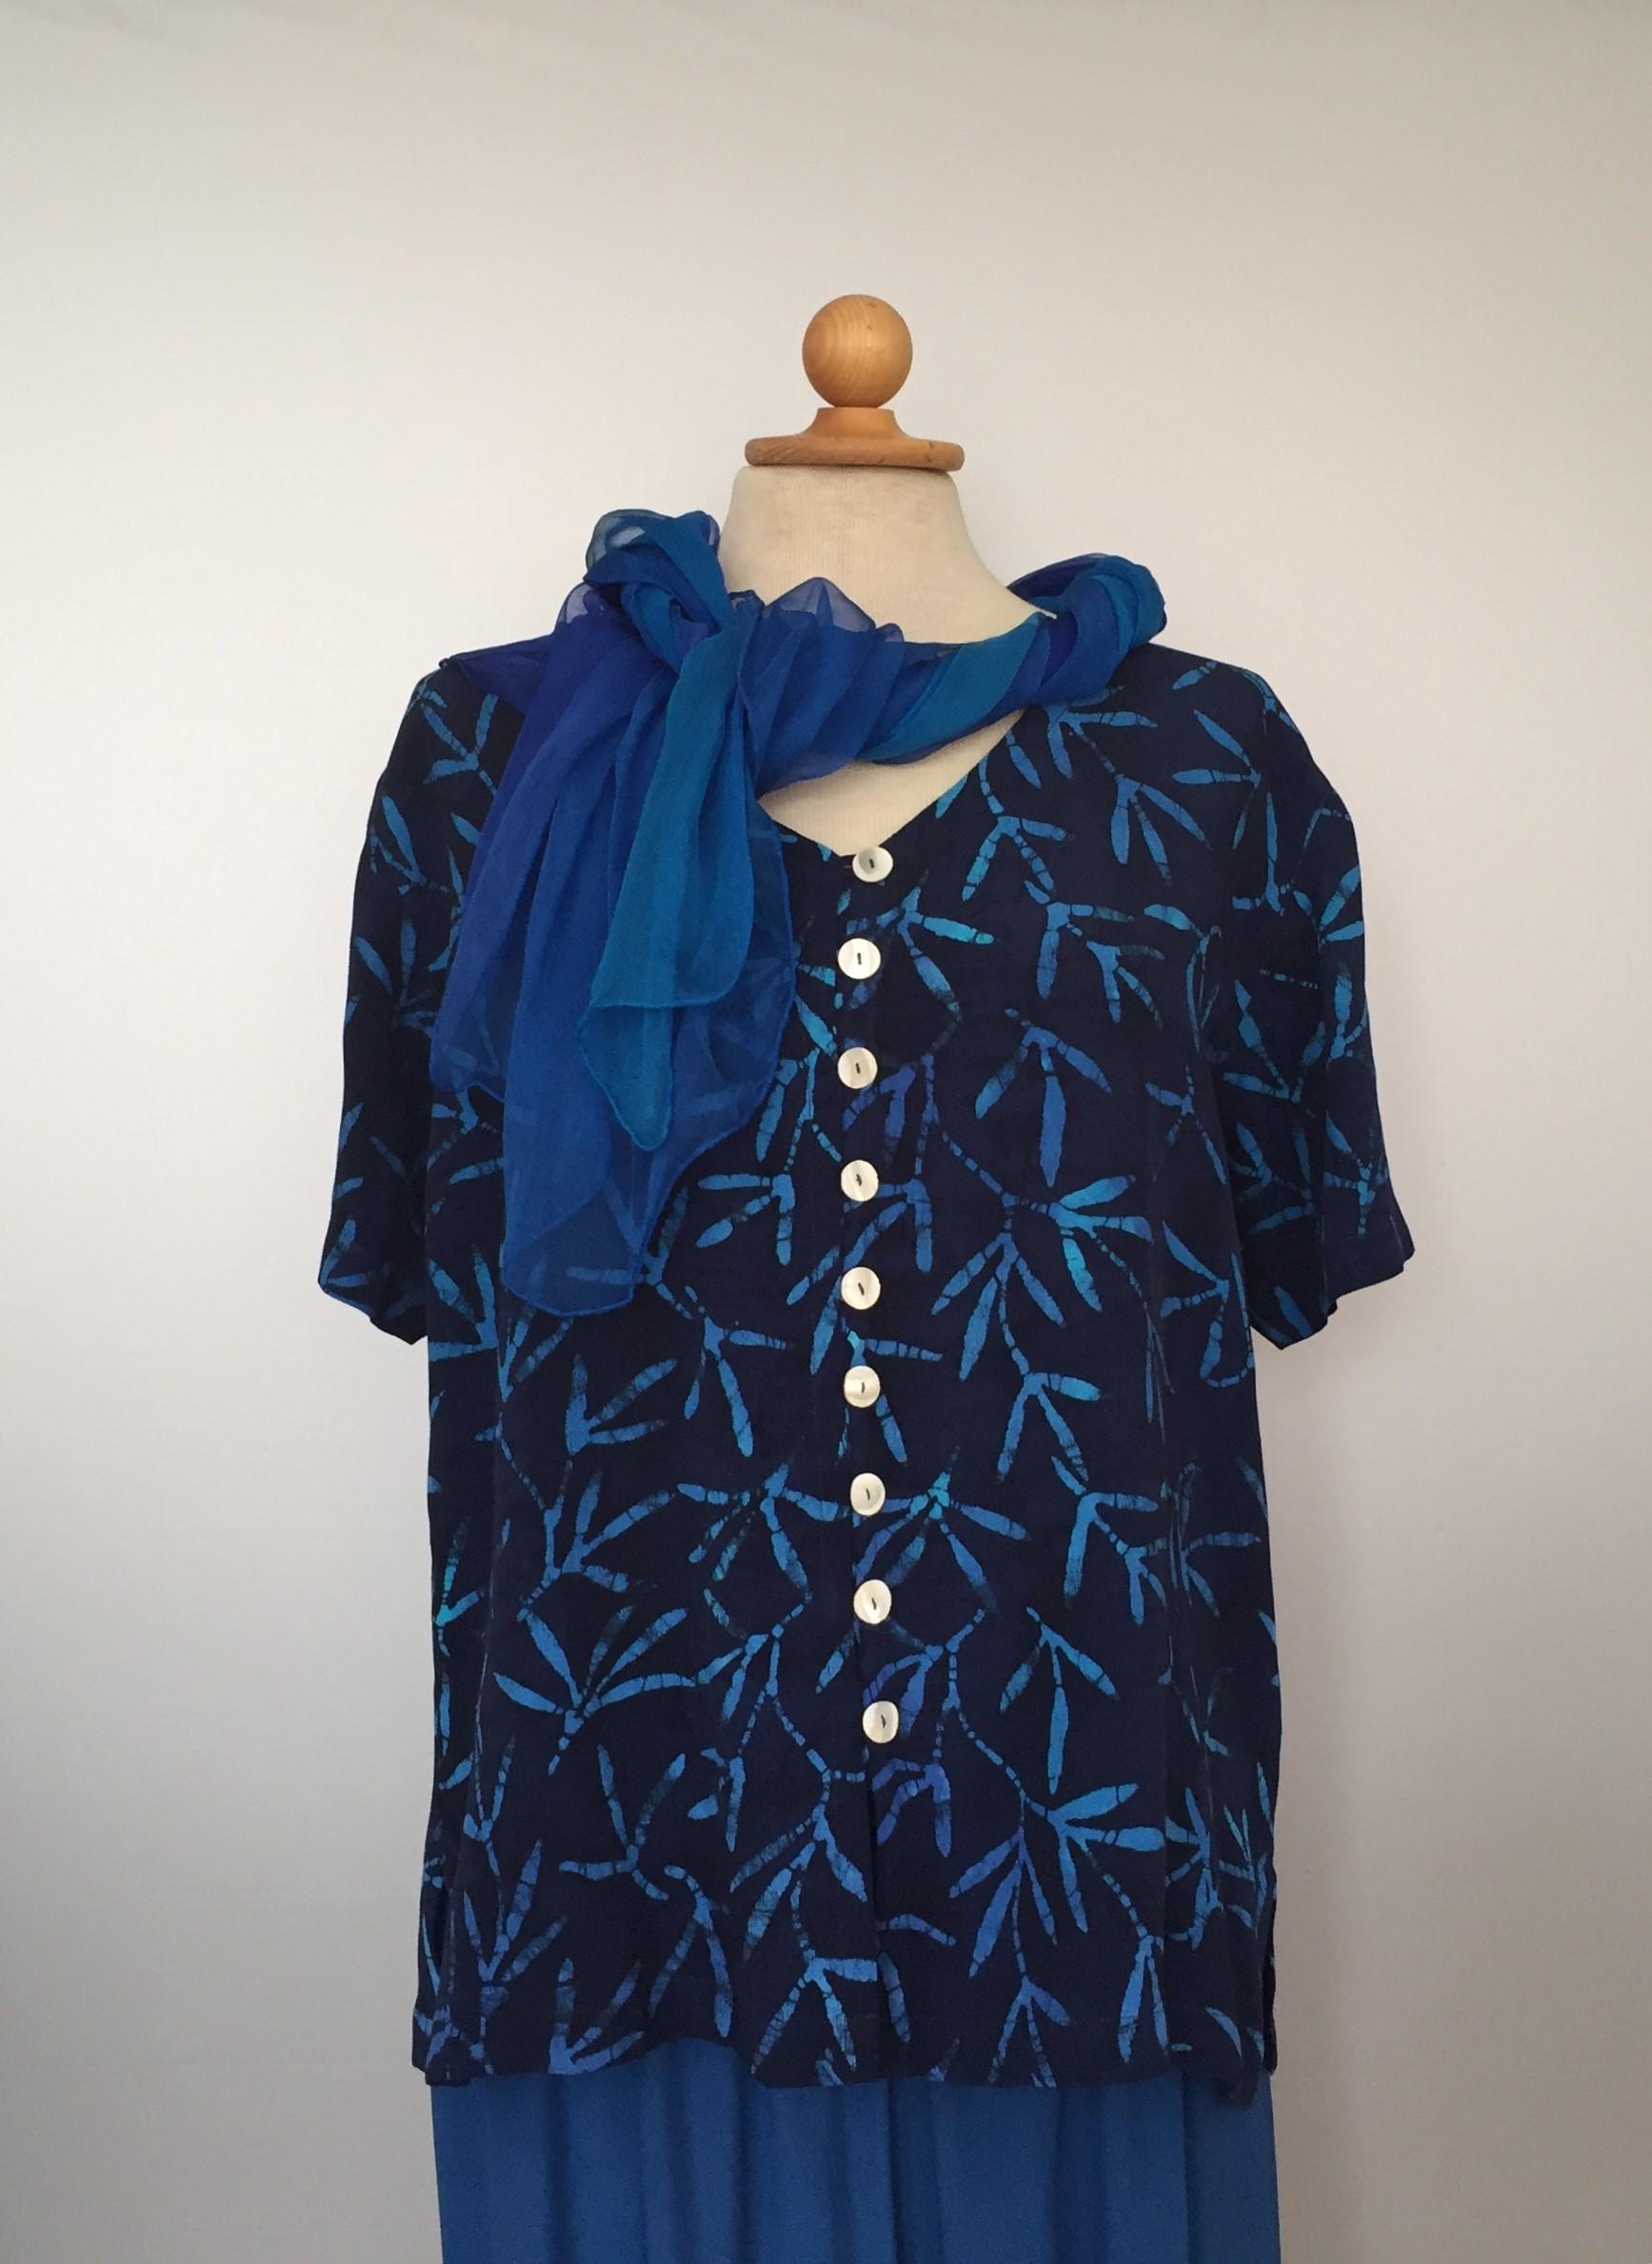 b97c00df33ad Batik bluse130 - Padi blå i lækkert crepestof med perlemorsknapper